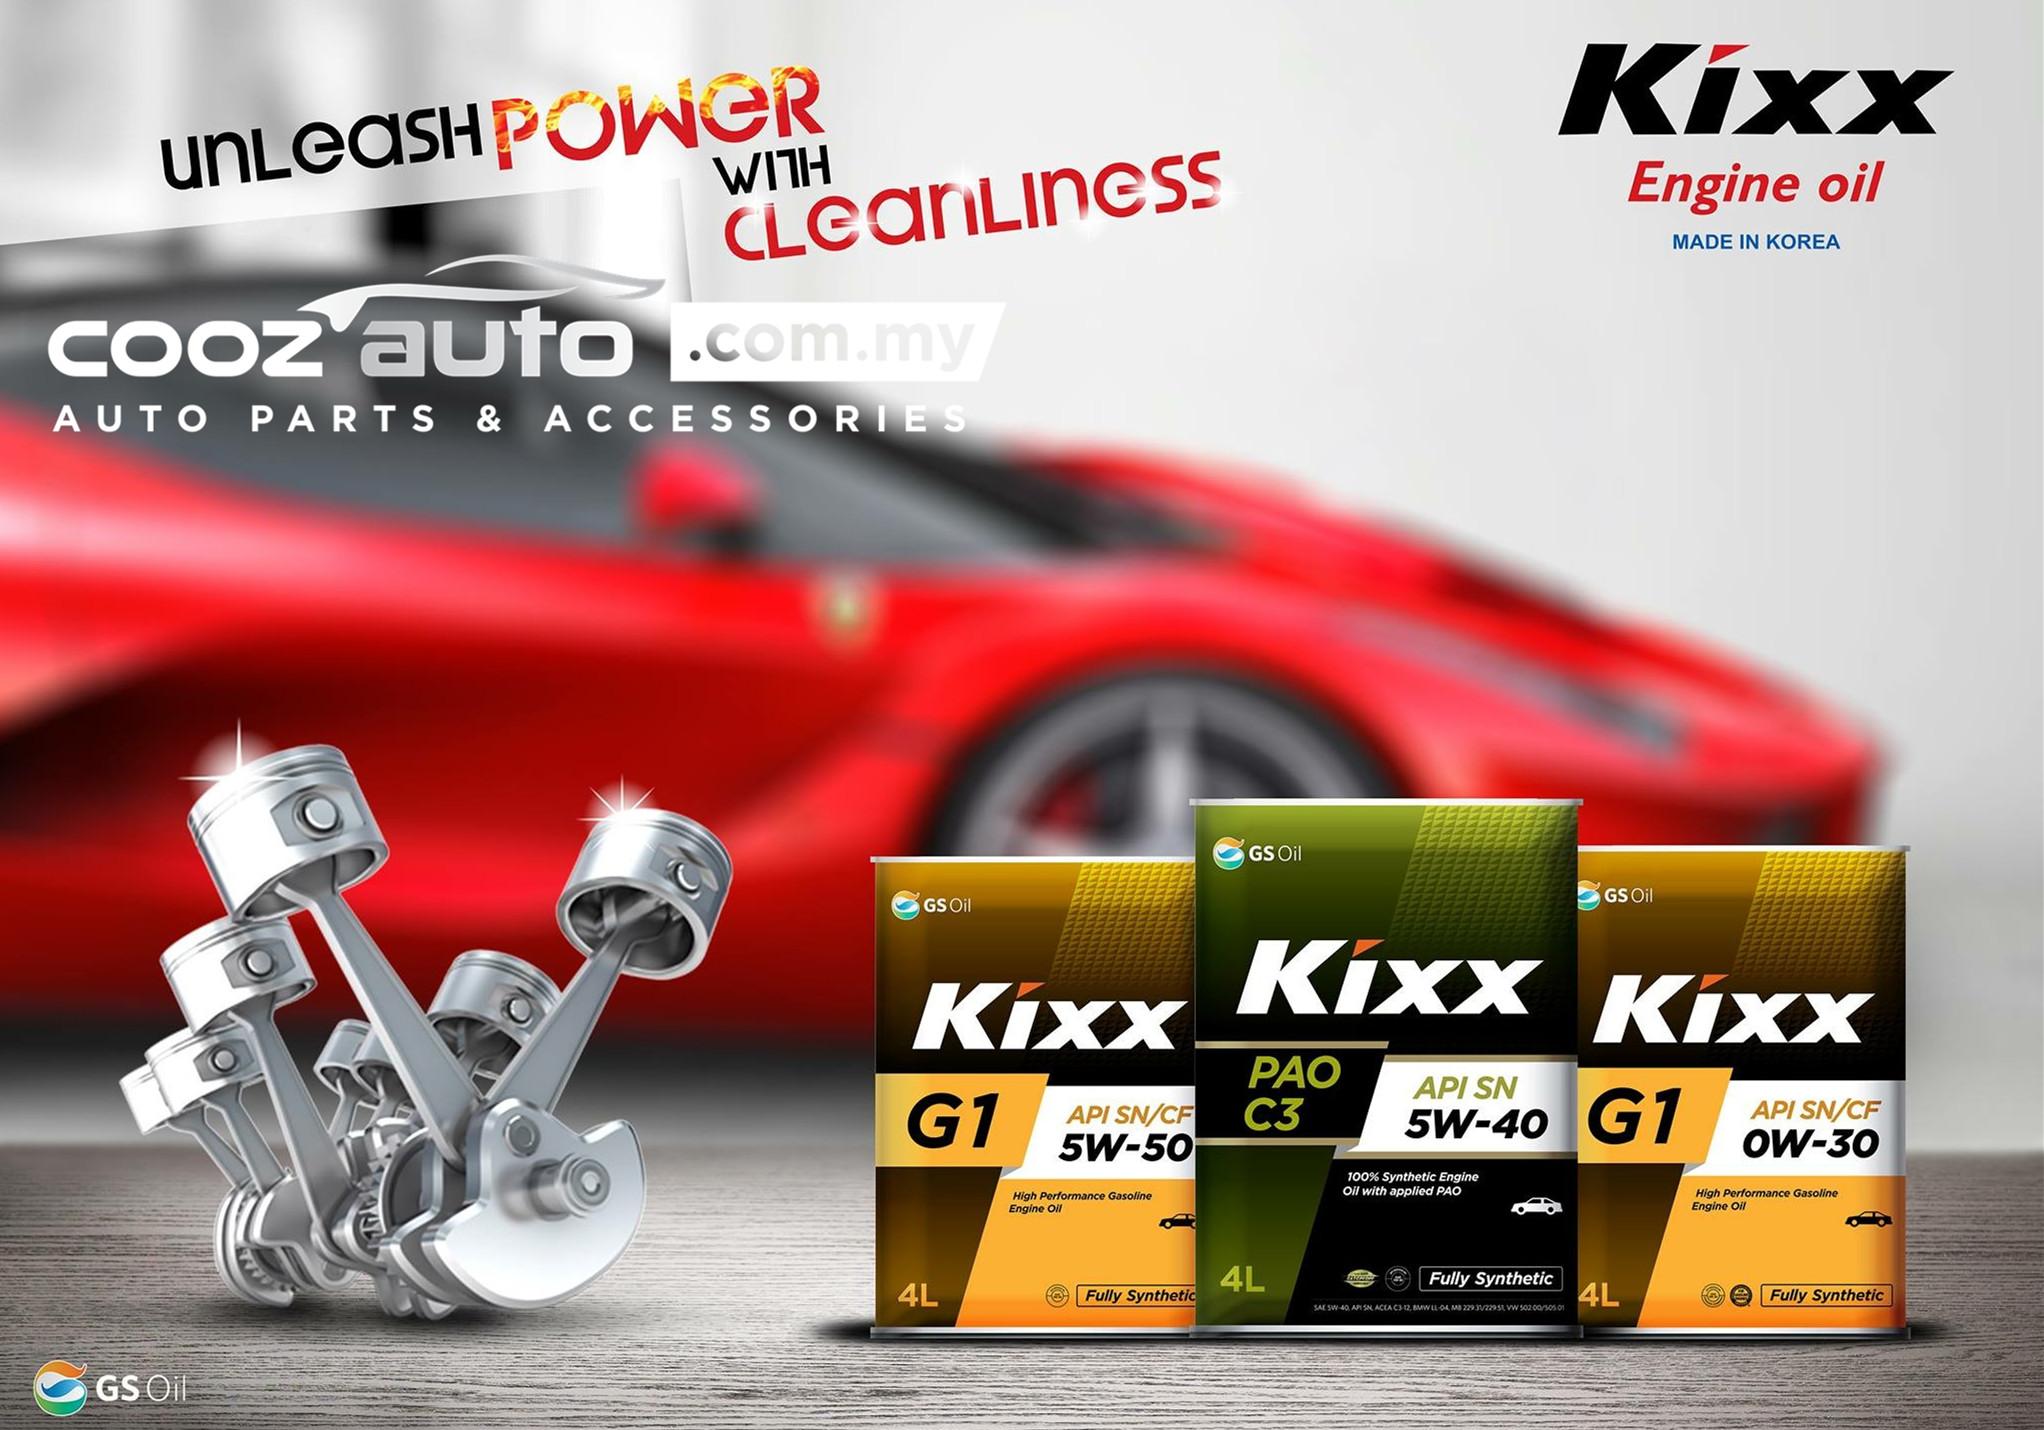 Kixx G1 10W40 Semi Synthetic Engine Oil Proton Perdana Persona Preve Putra (4L)